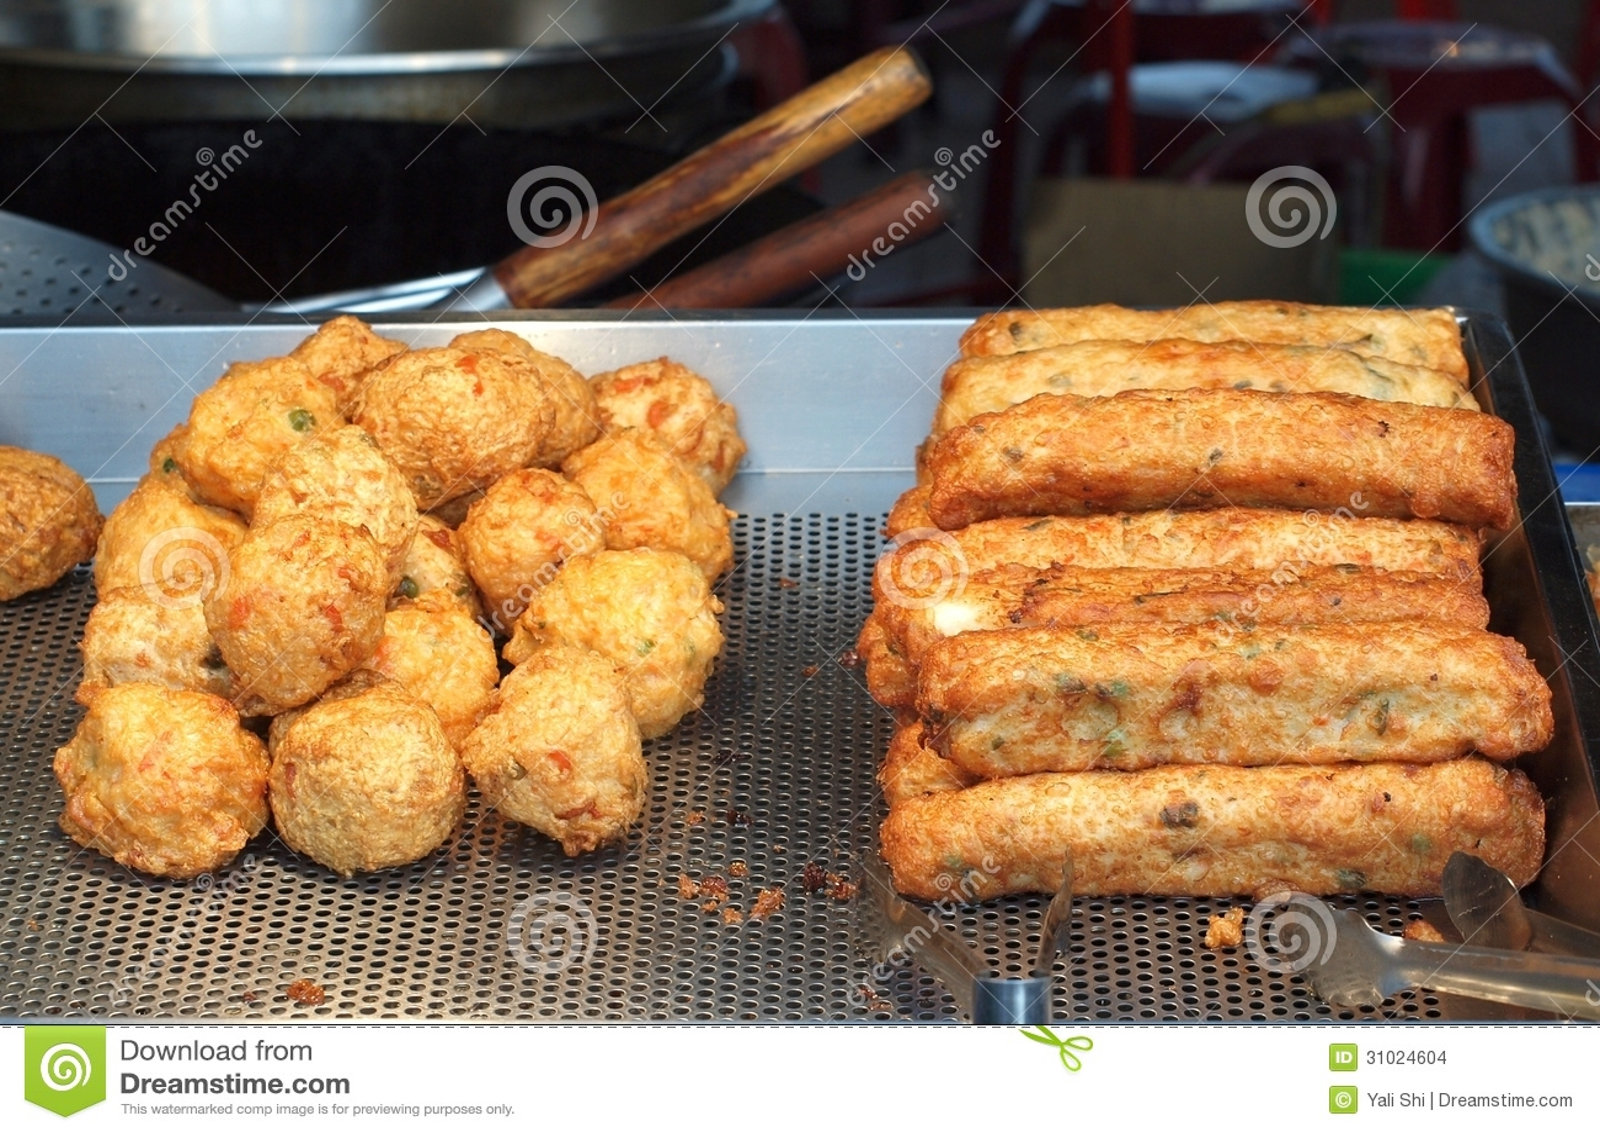 Chinese fish balls and fish sausages stock images image for Chinese fish balls